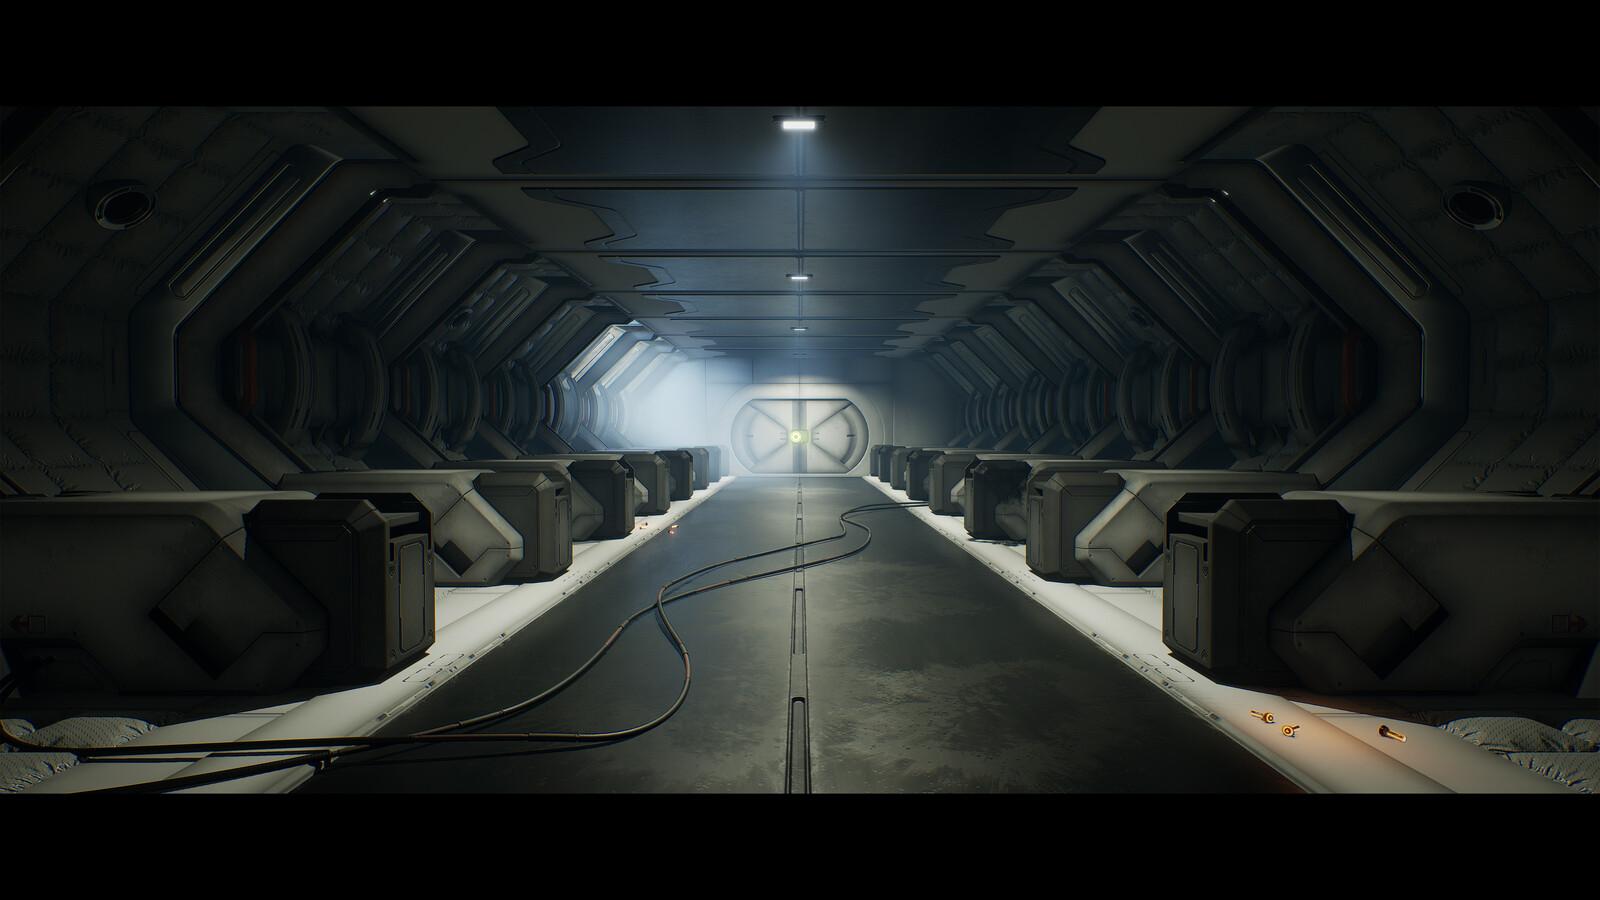 Mass Effect Inspired Sci-Fi Corridor